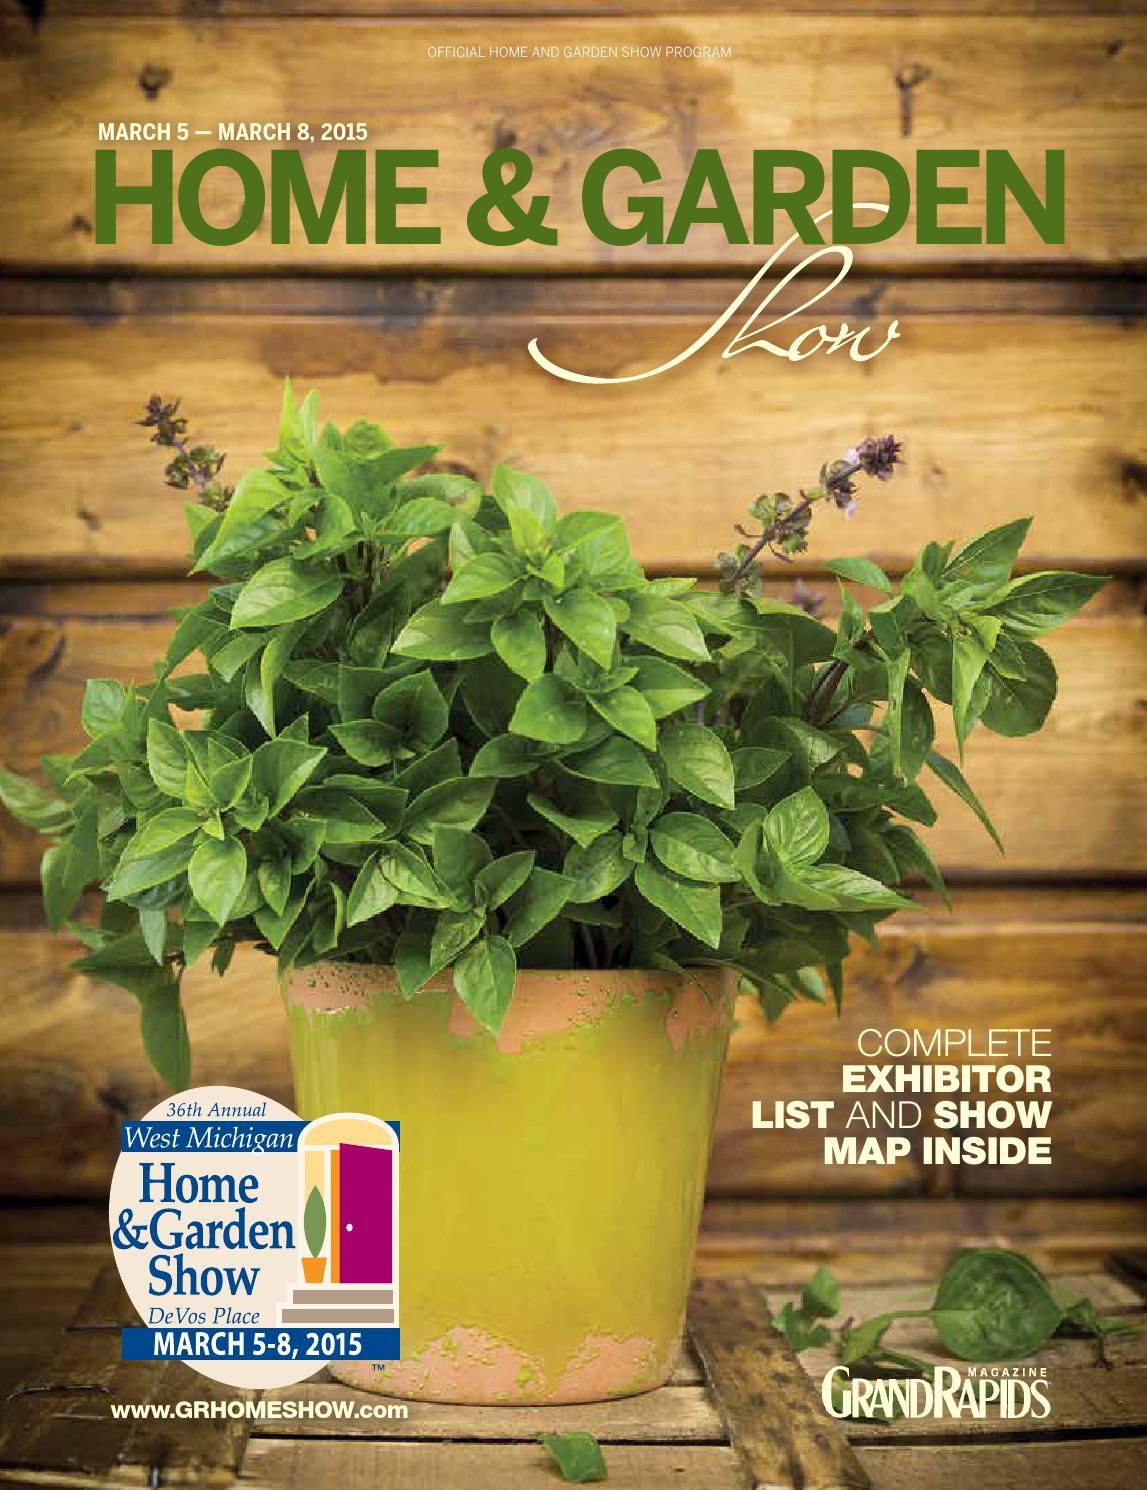 West Michigan Home Garden Show Program 2015 By